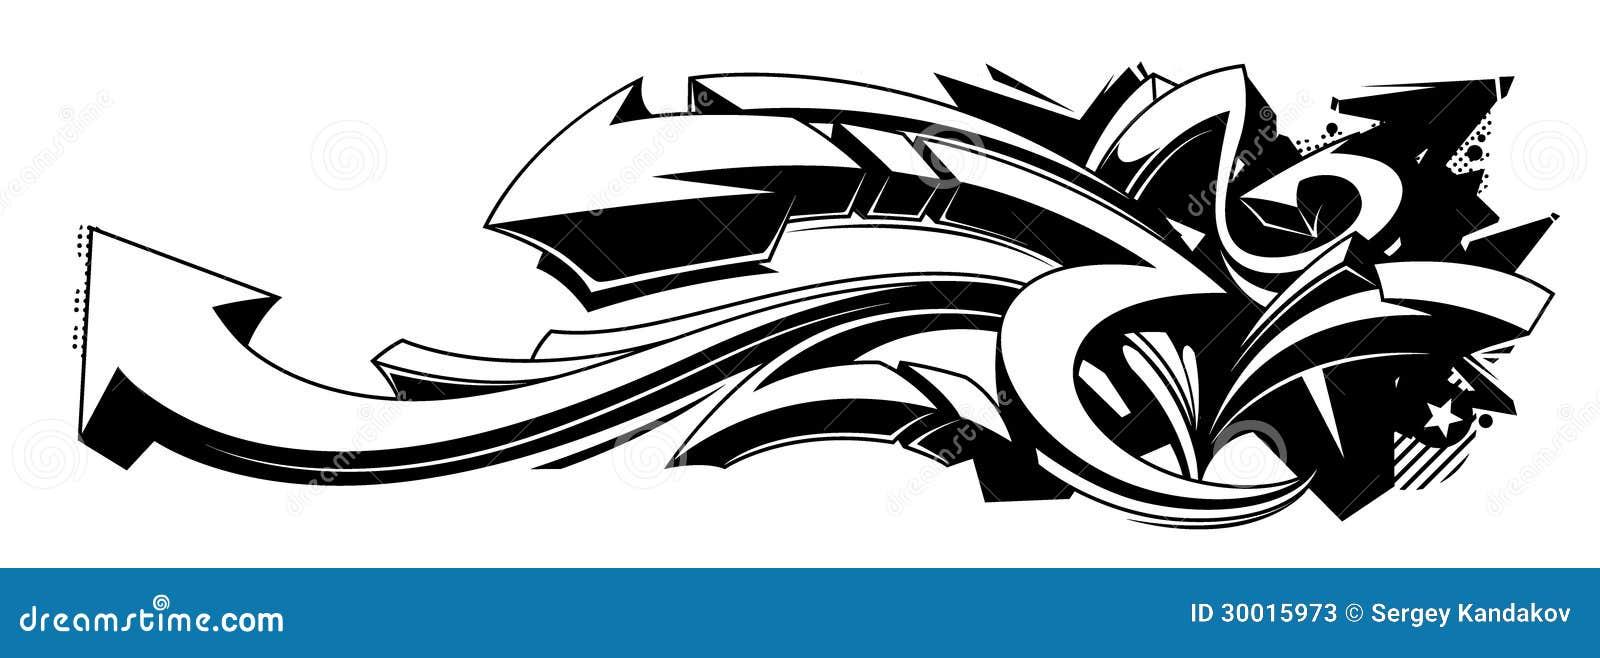 Graffiti Background Stock Vector Image Of Hip Grunge